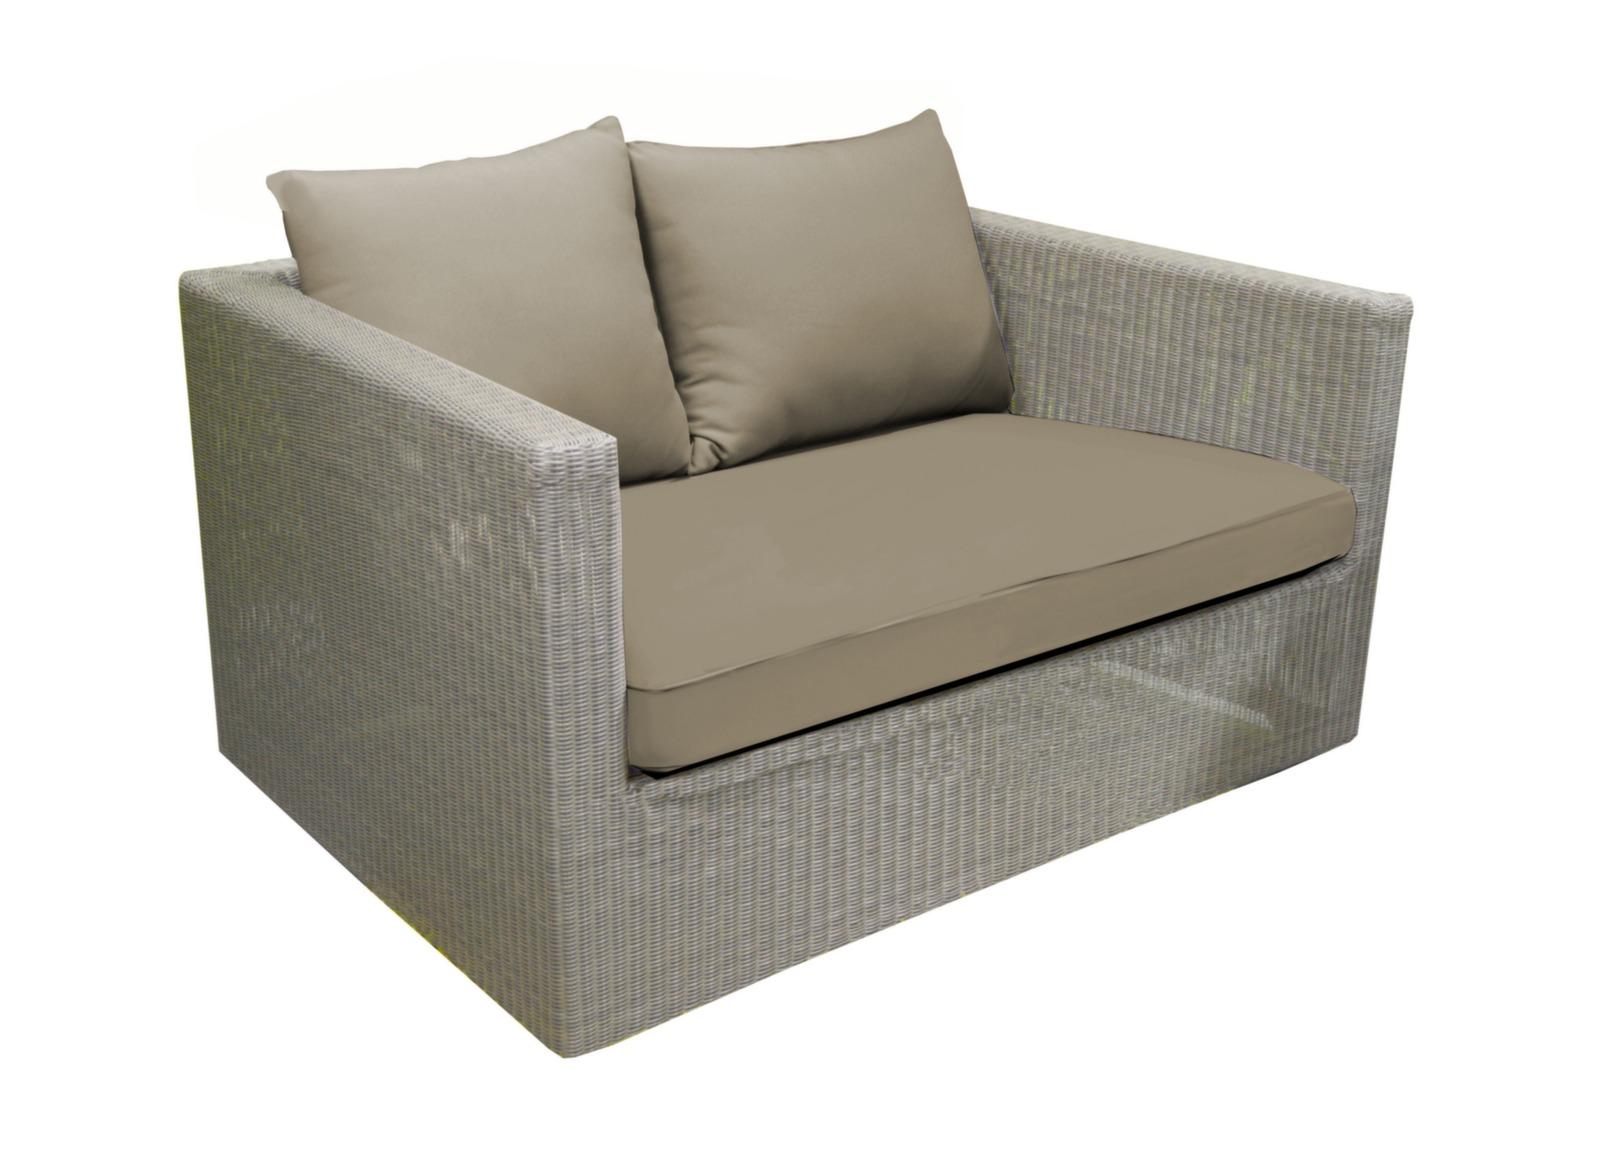 canap de jardin 2 places r sine tress e meadow oc o. Black Bedroom Furniture Sets. Home Design Ideas